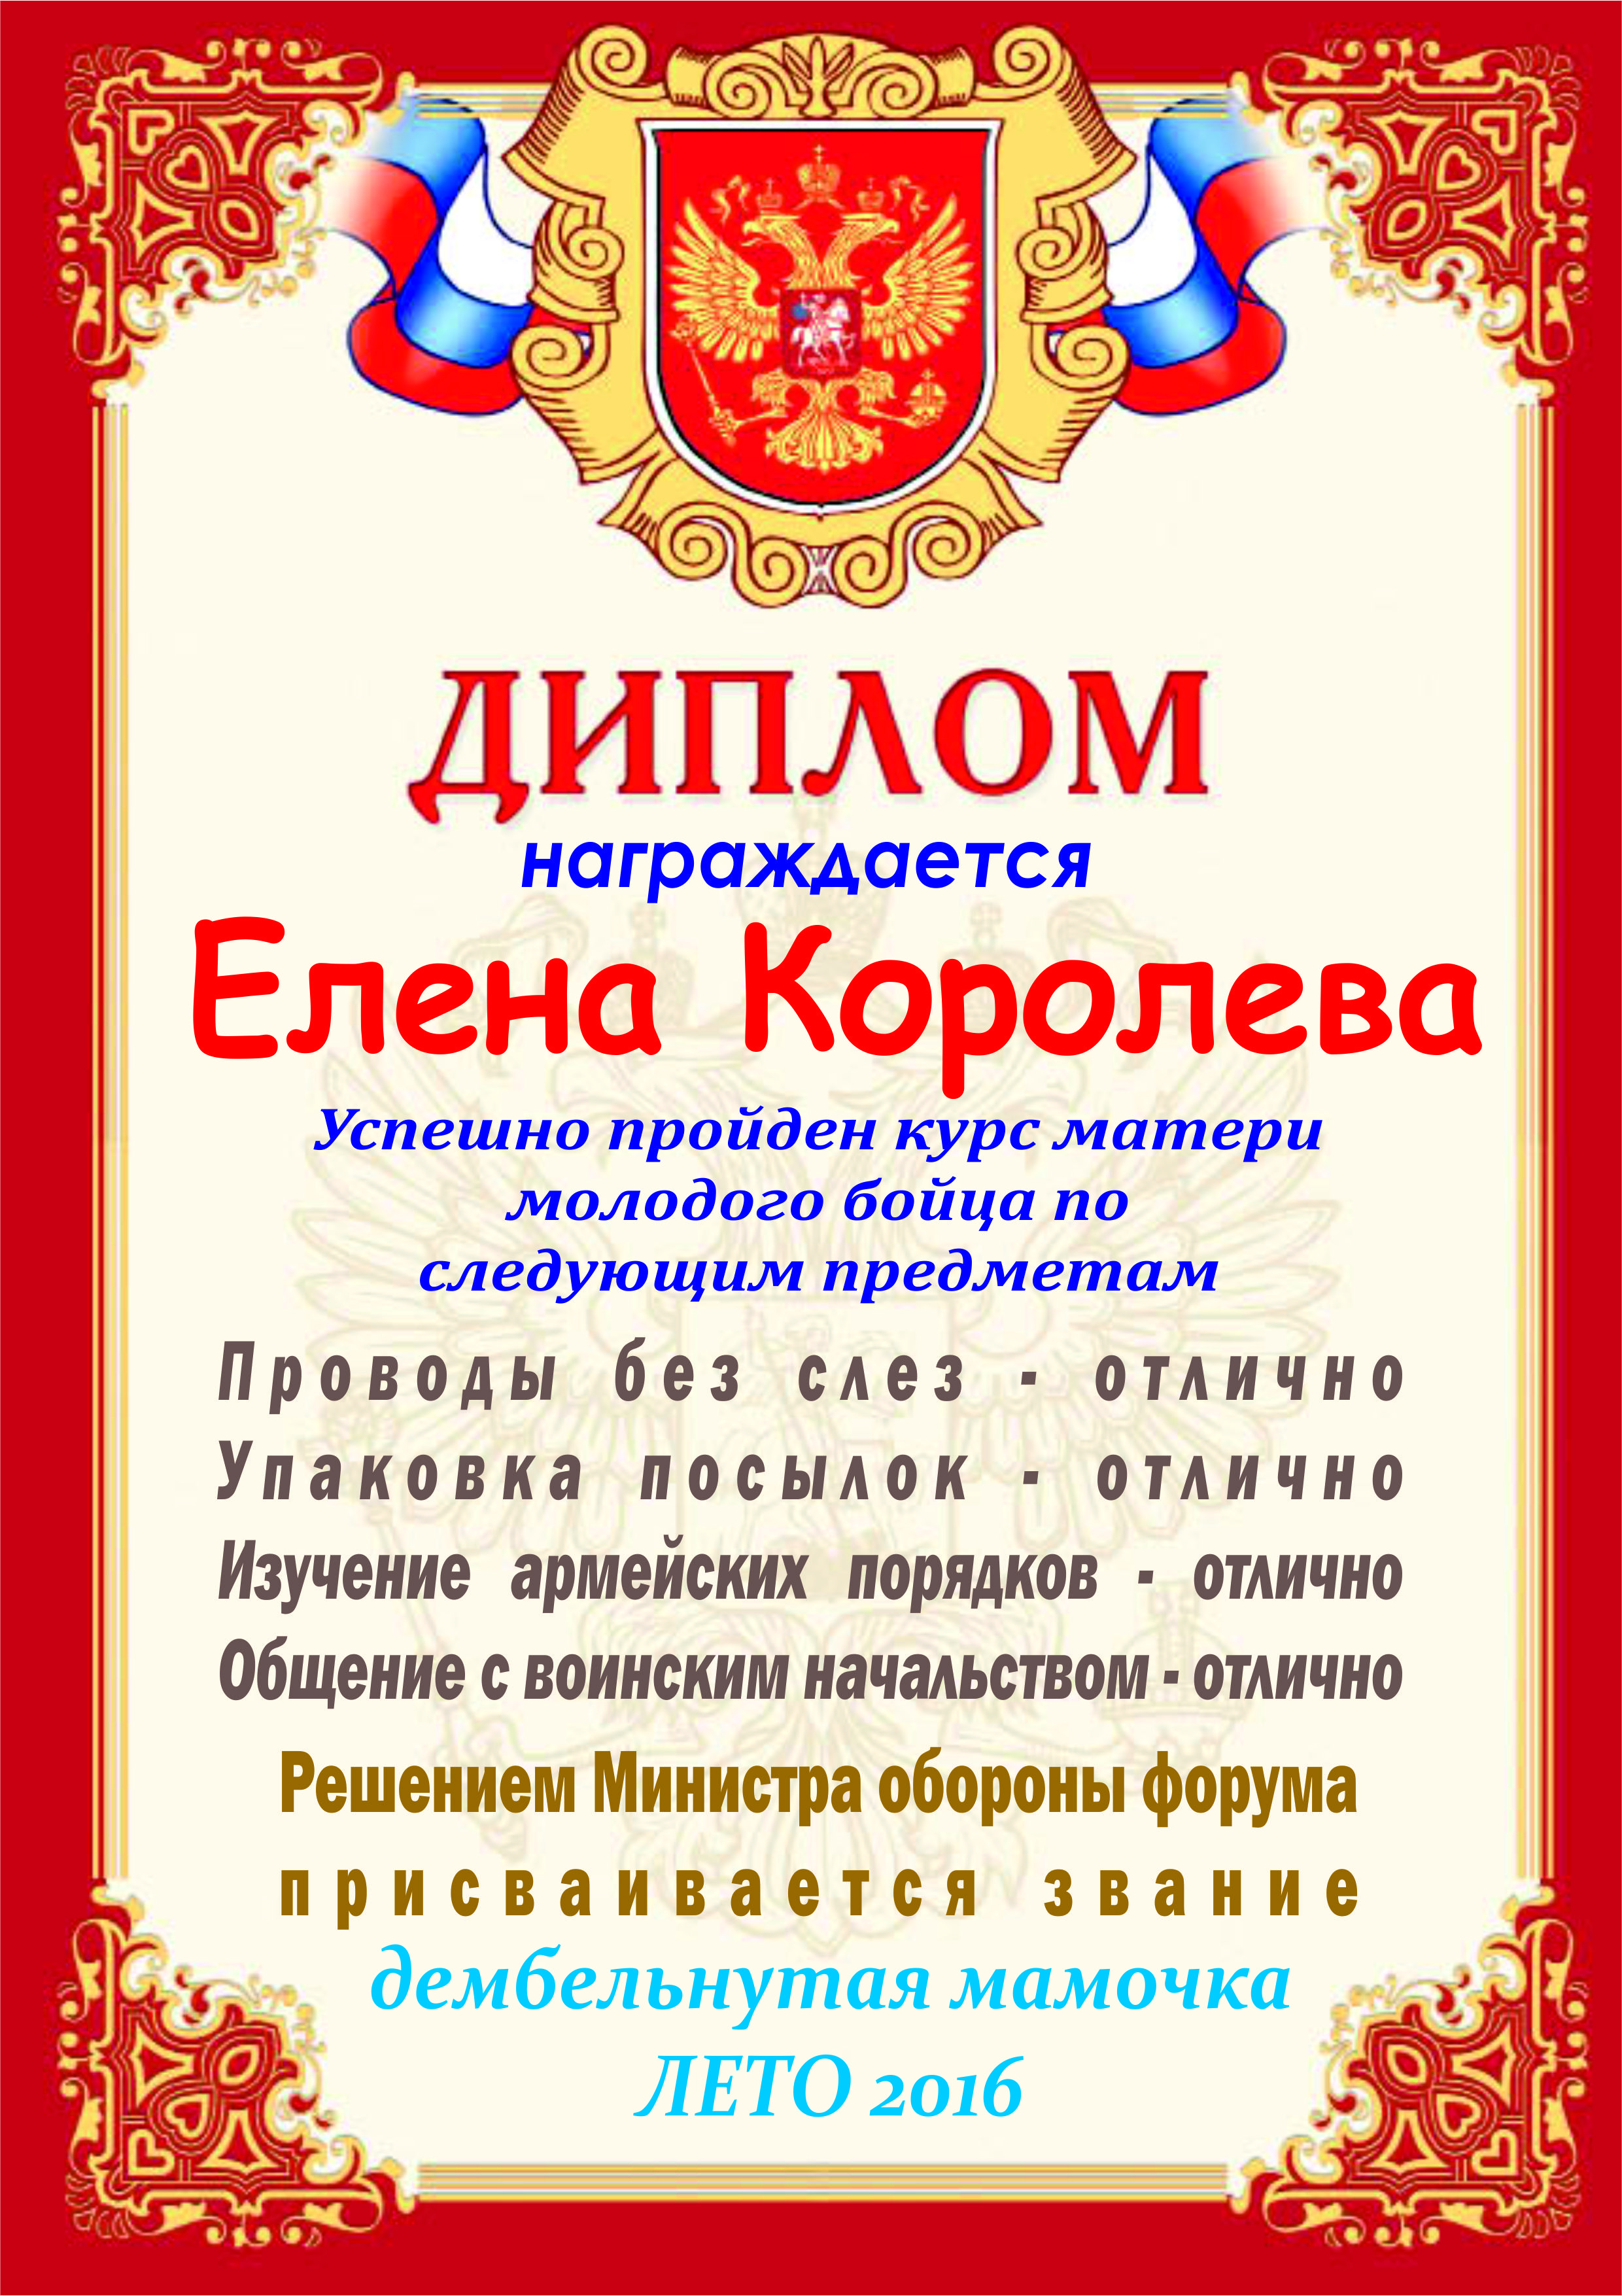 http://s5.uploads.ru/jKXca.jpg